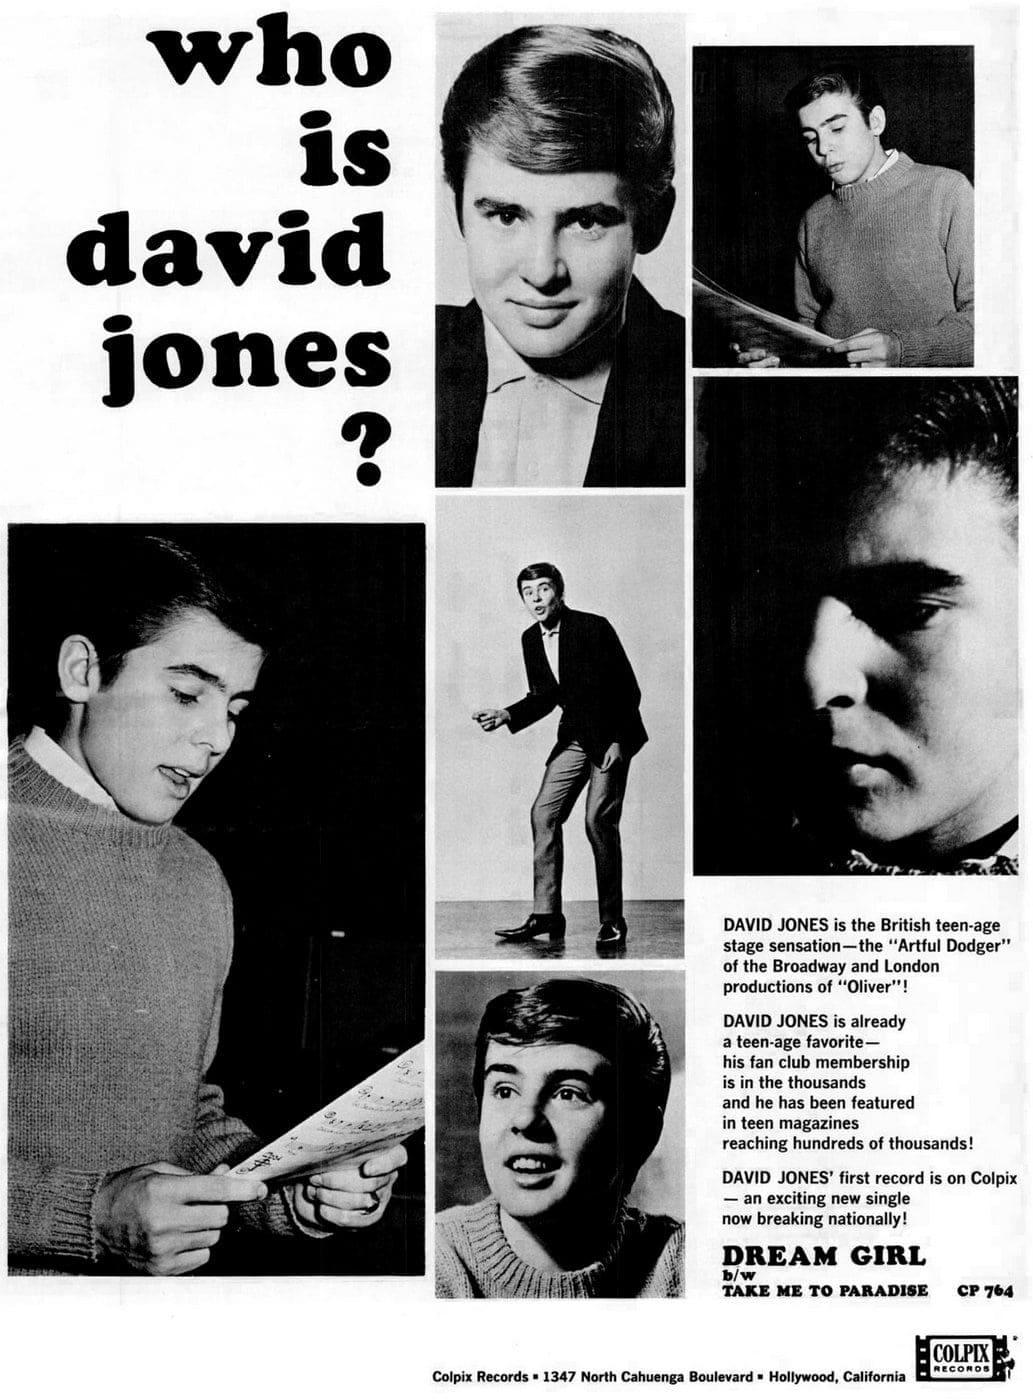 Billboard Feb 20, 1965 Davy Jones